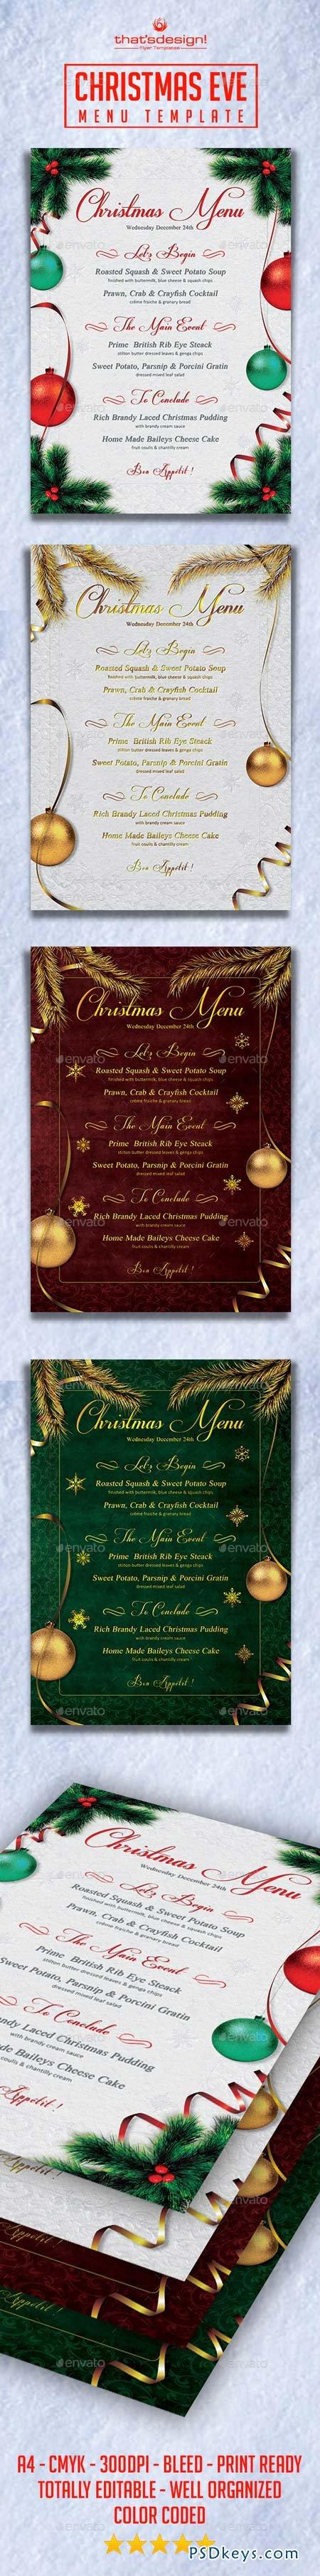 christmas eve menu template photoshop christmas eve menu template 9207575